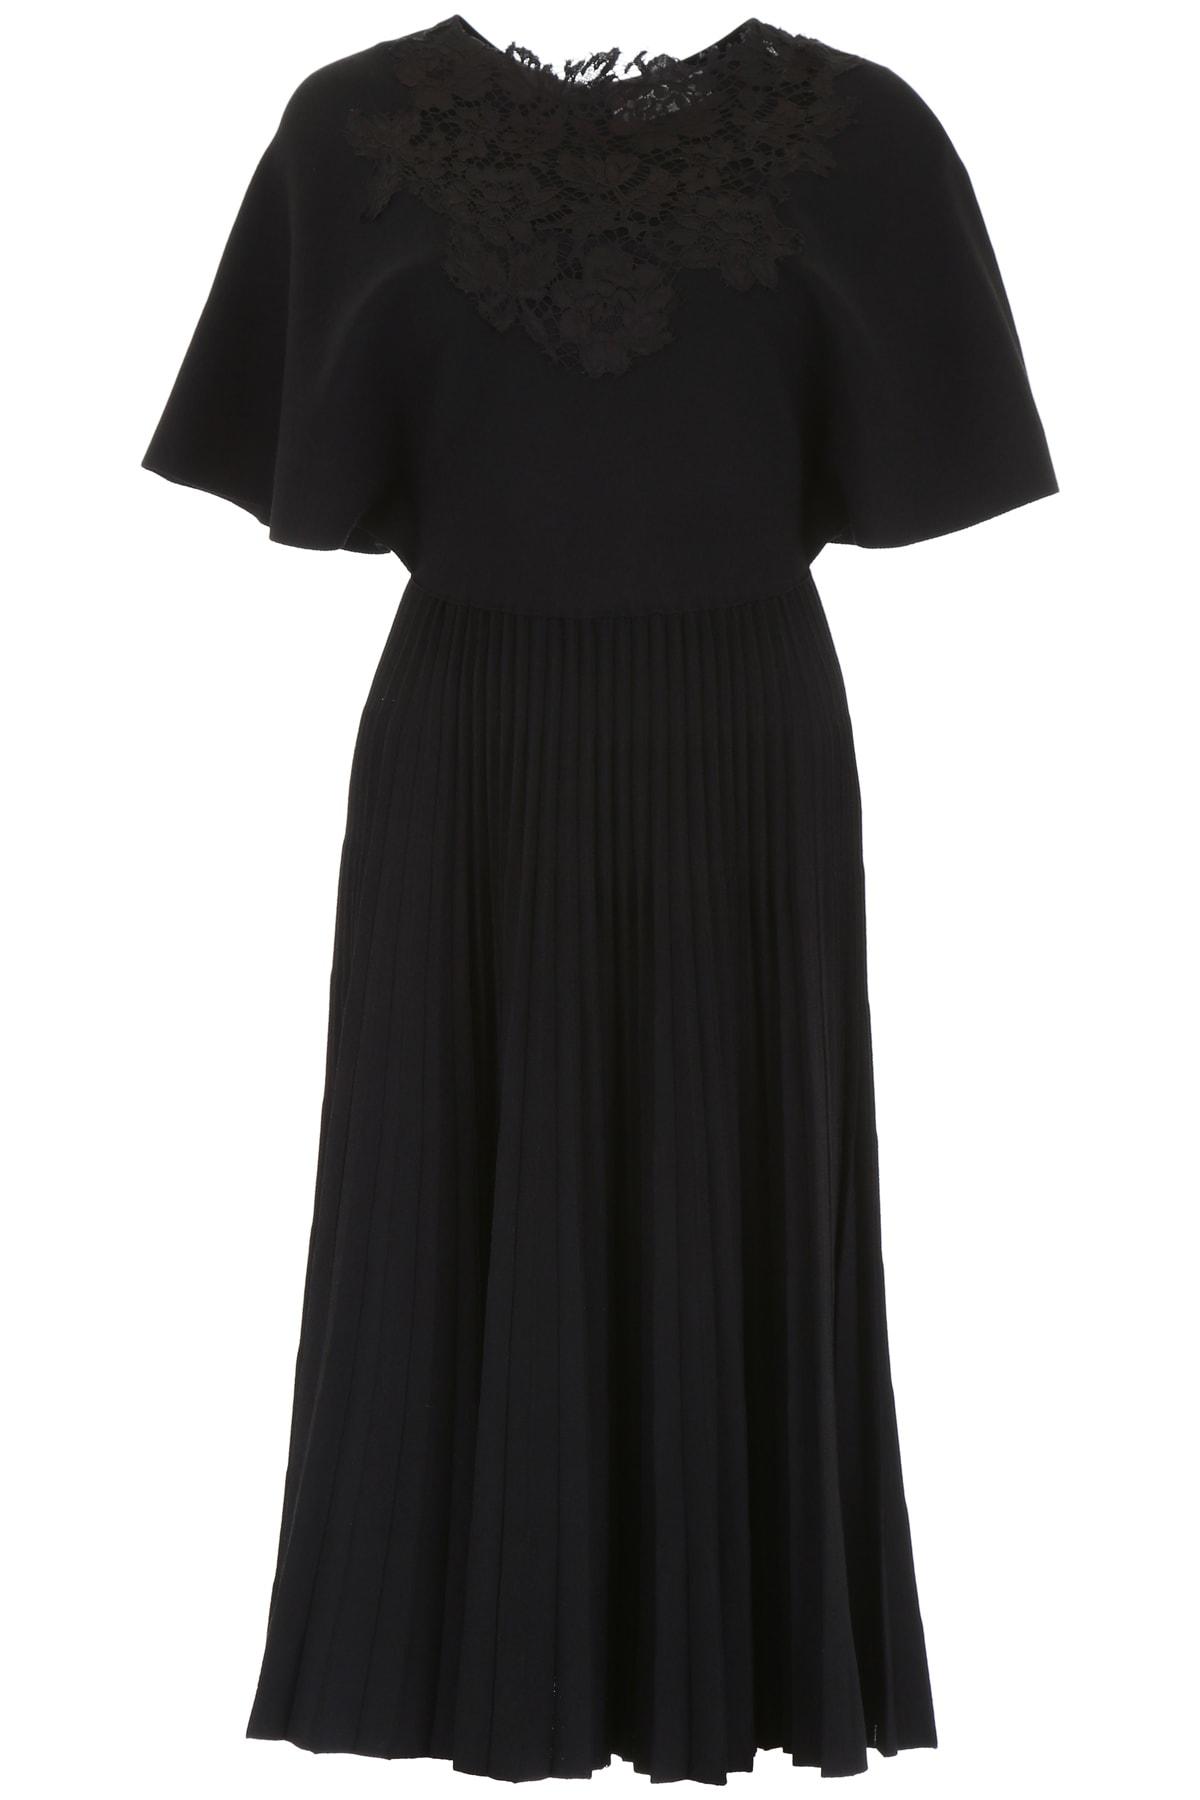 Valentino Pleated Jersey Dress